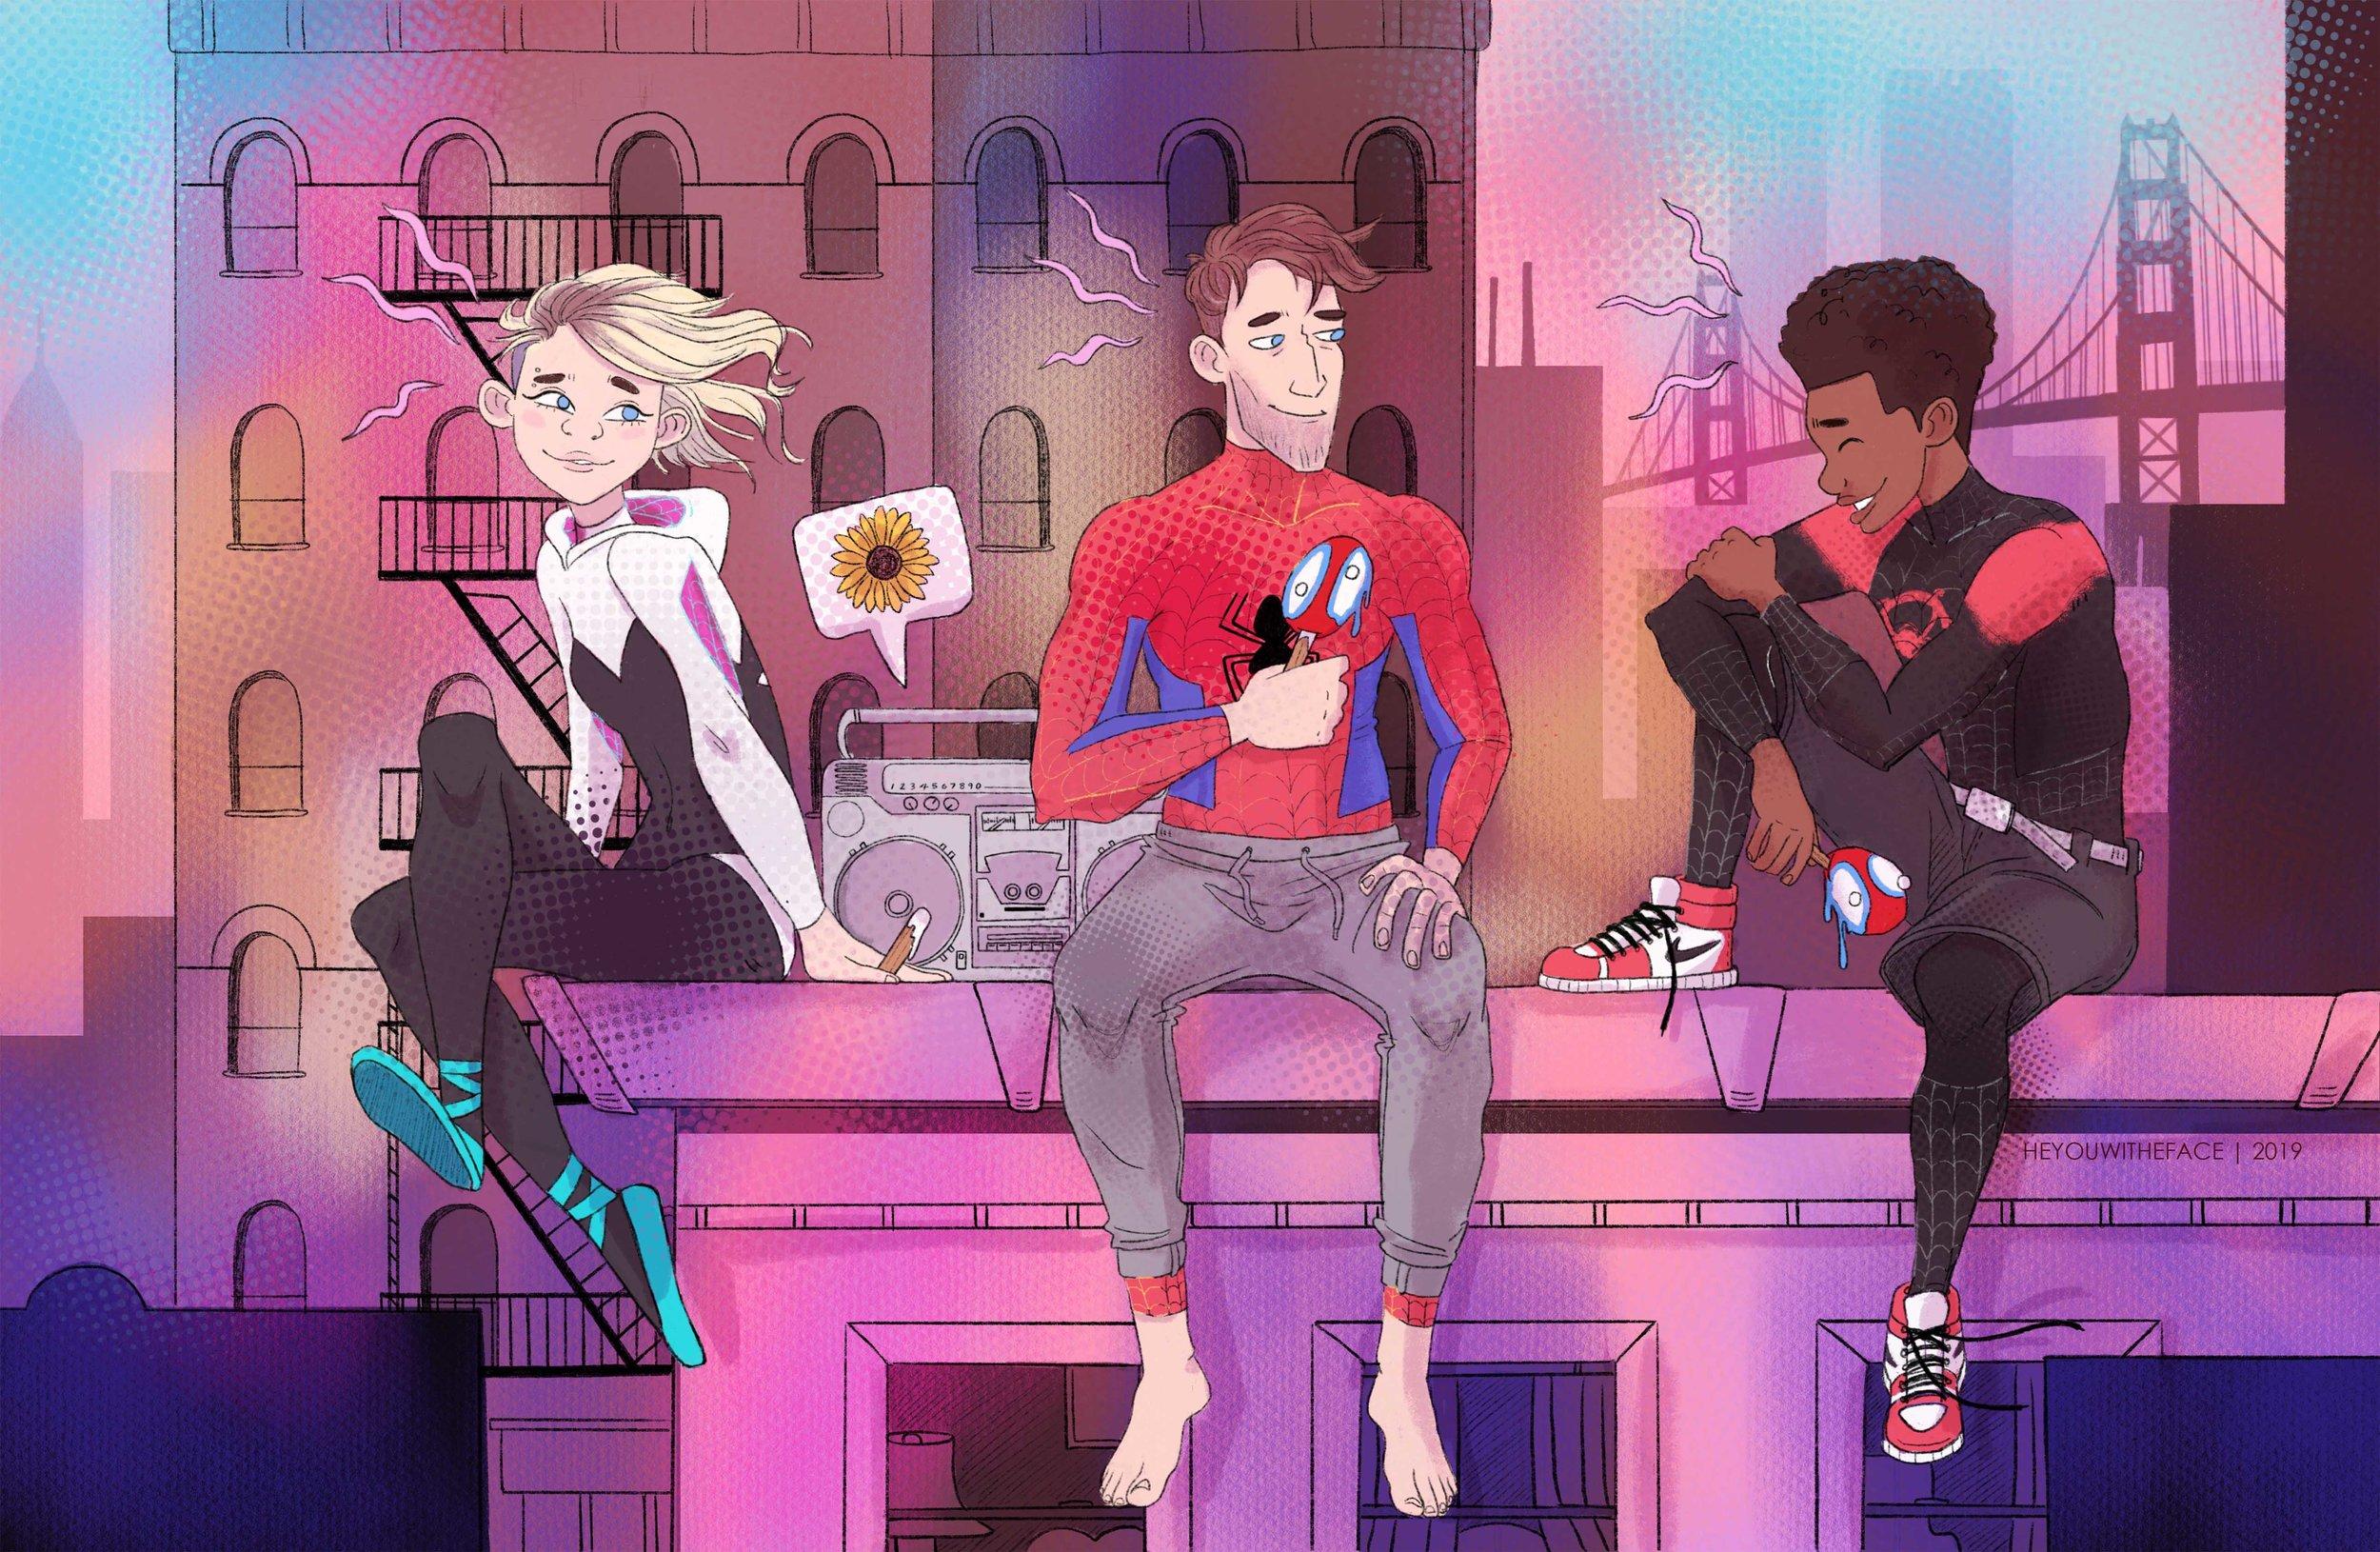 Spiderverse_11x17.jpg